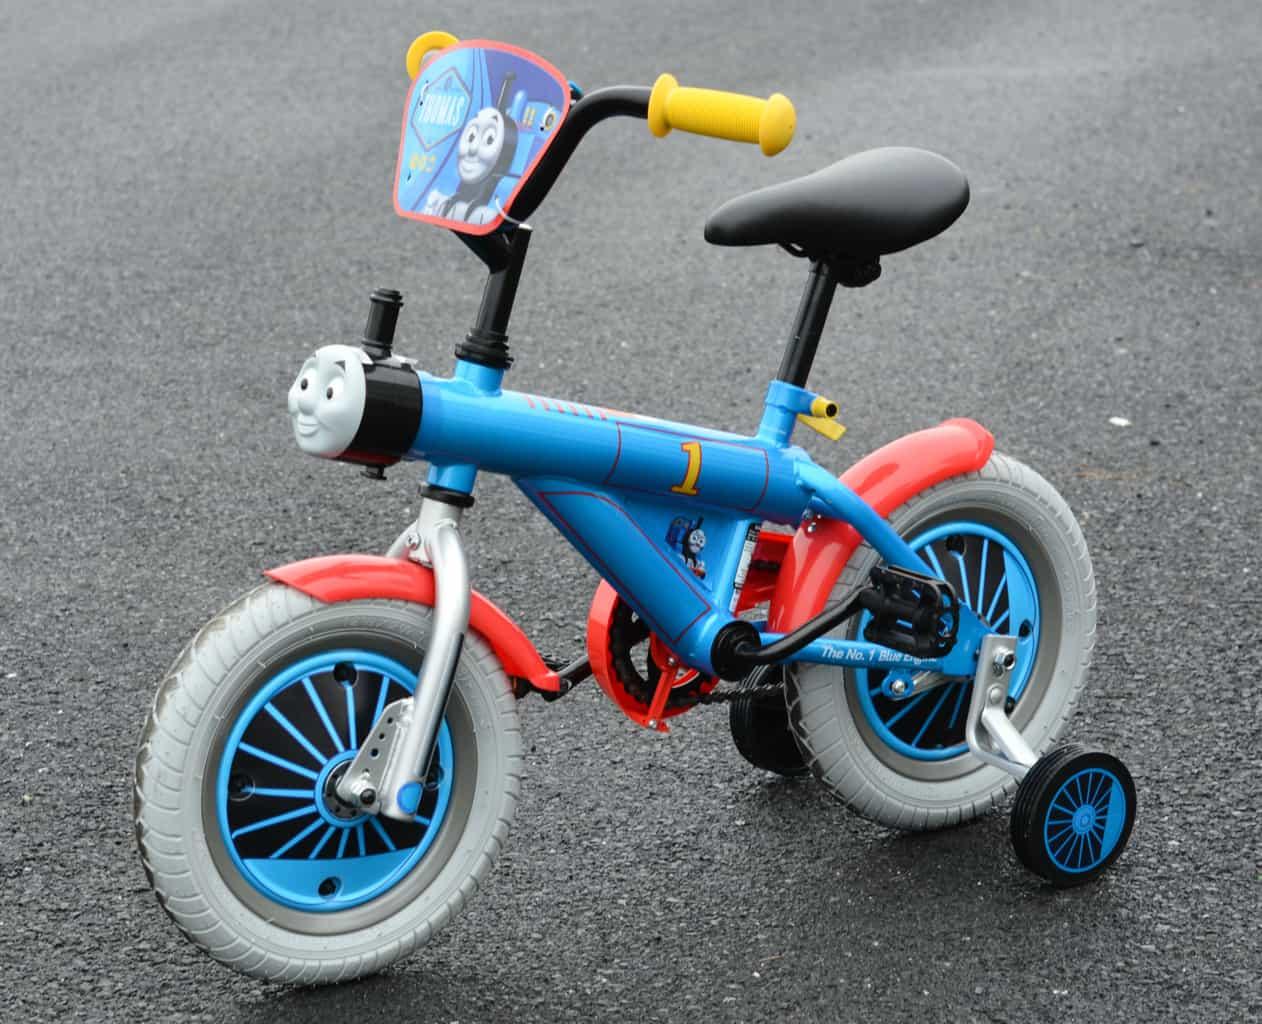 thomas-the-tank-engine-bike-2